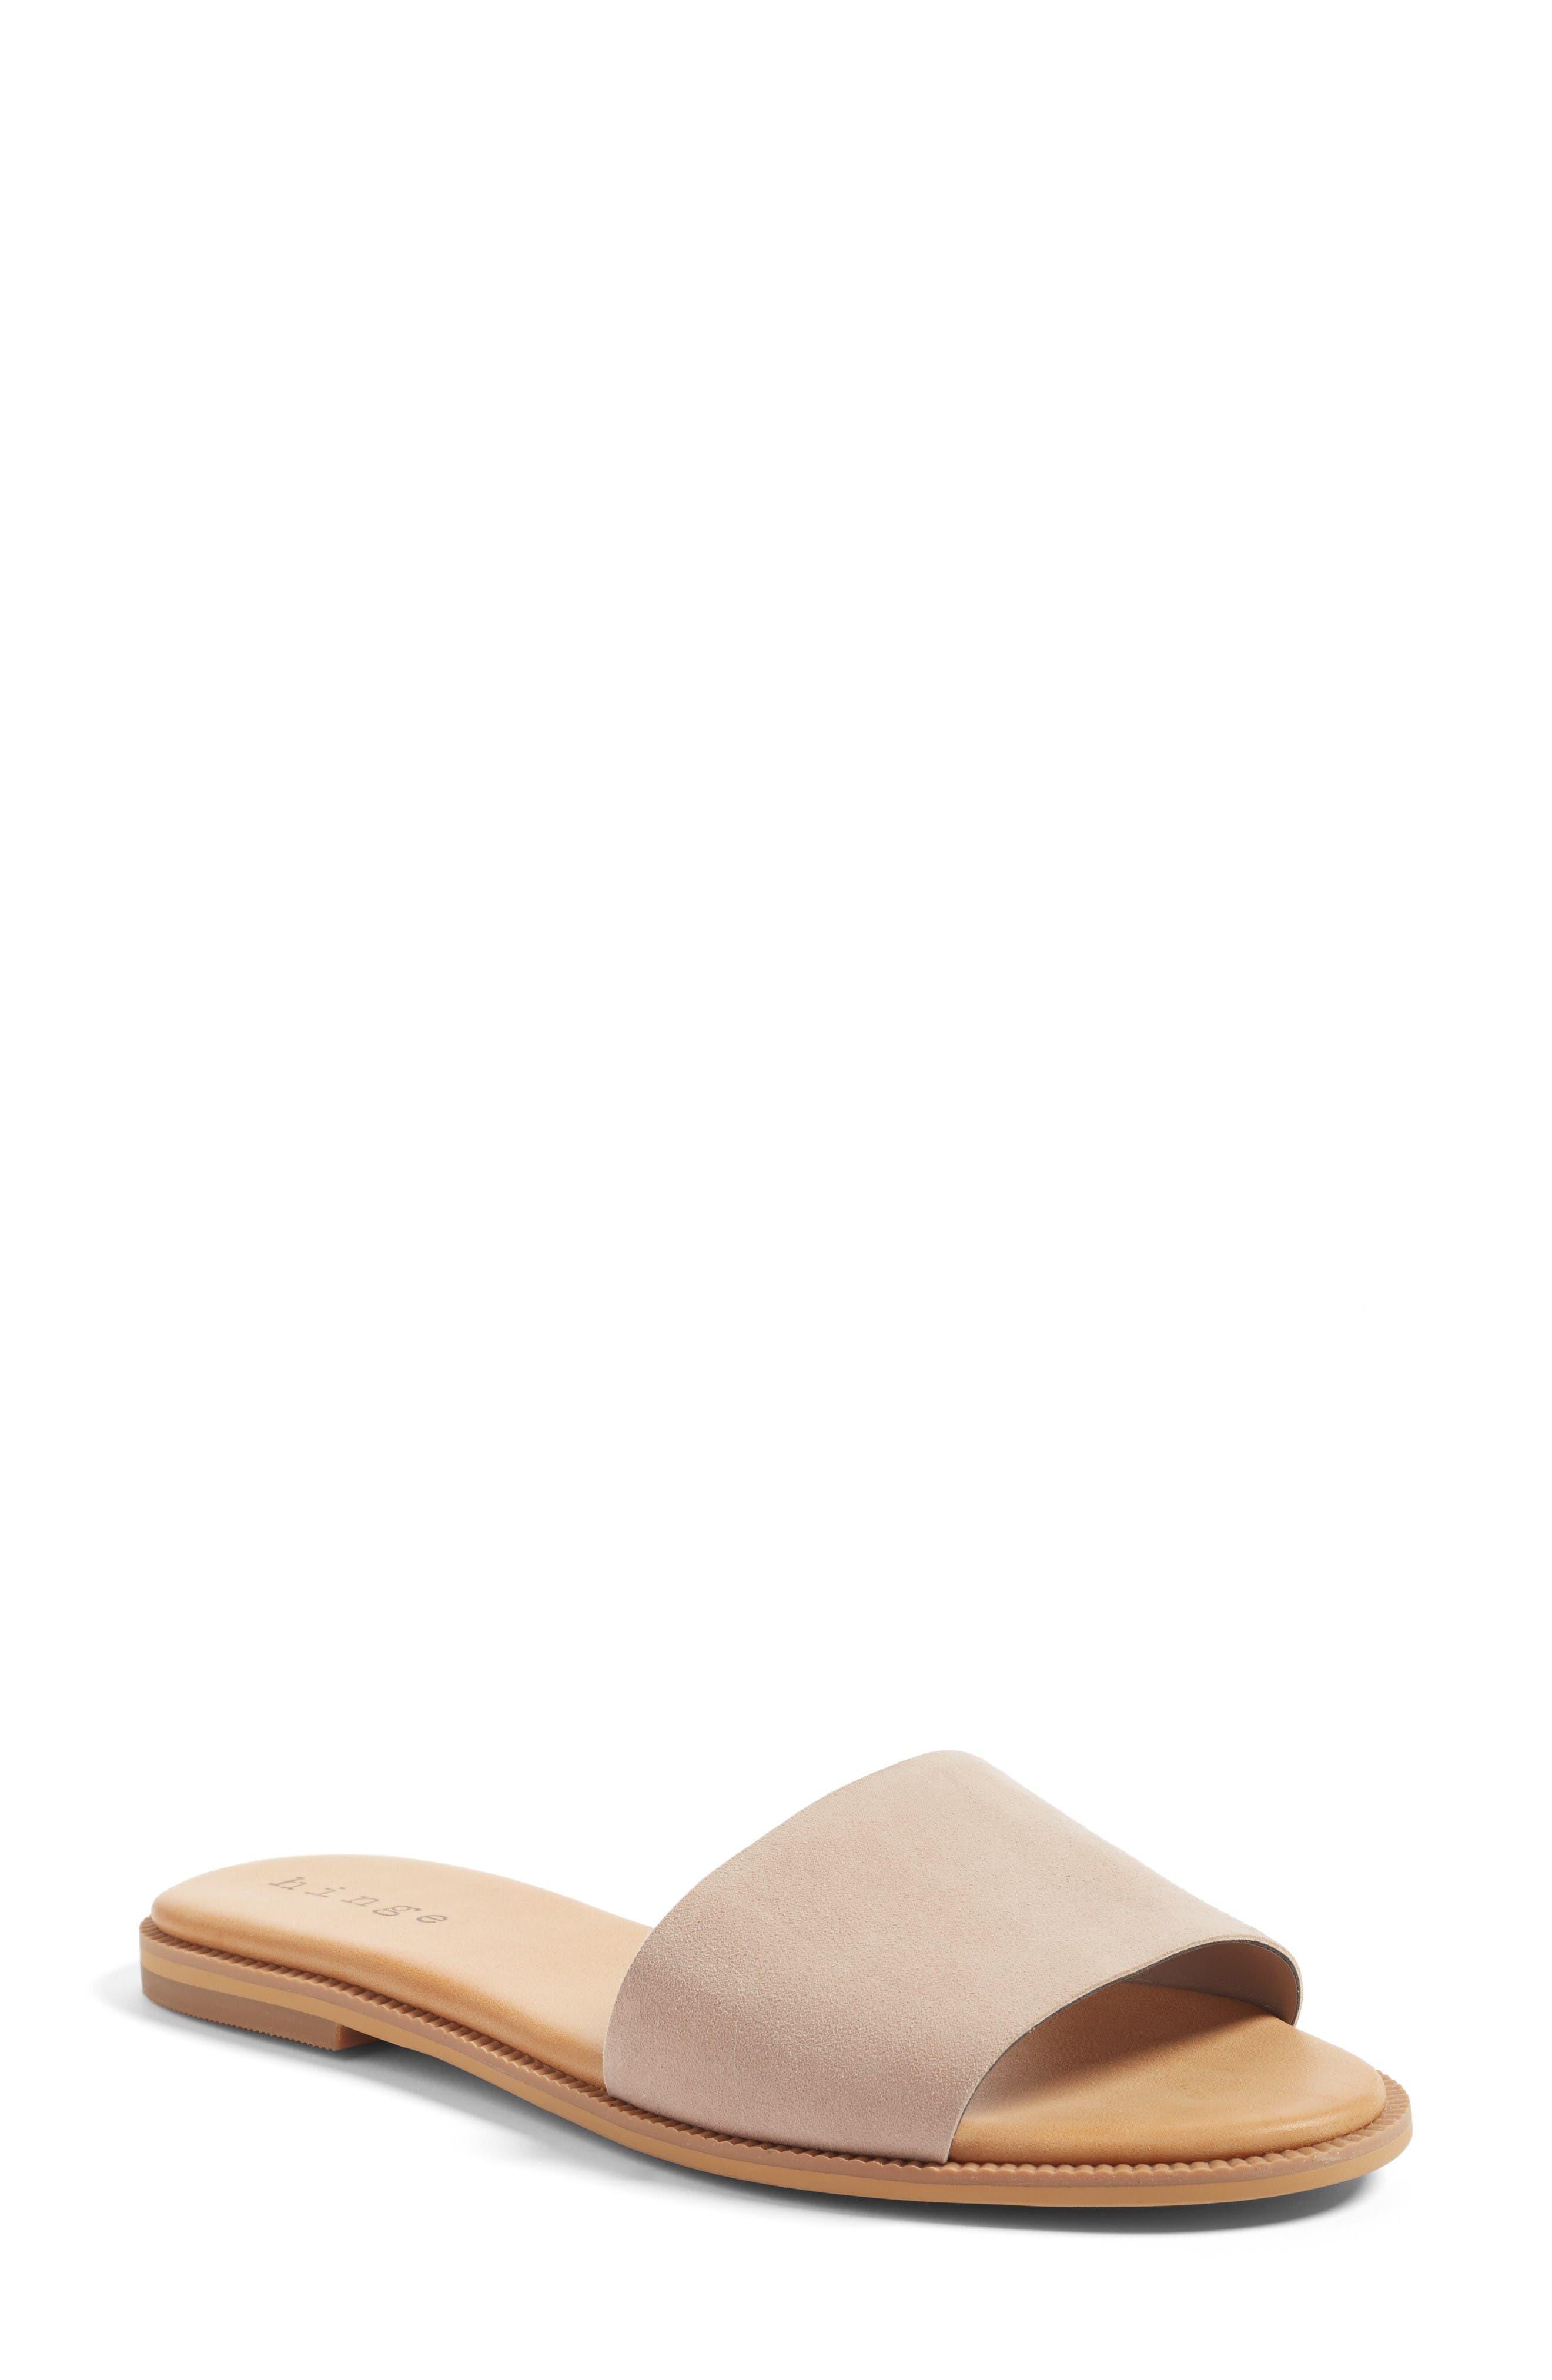 Main Image - Hinge 'Mere' Flat Slide Sandal (Women)